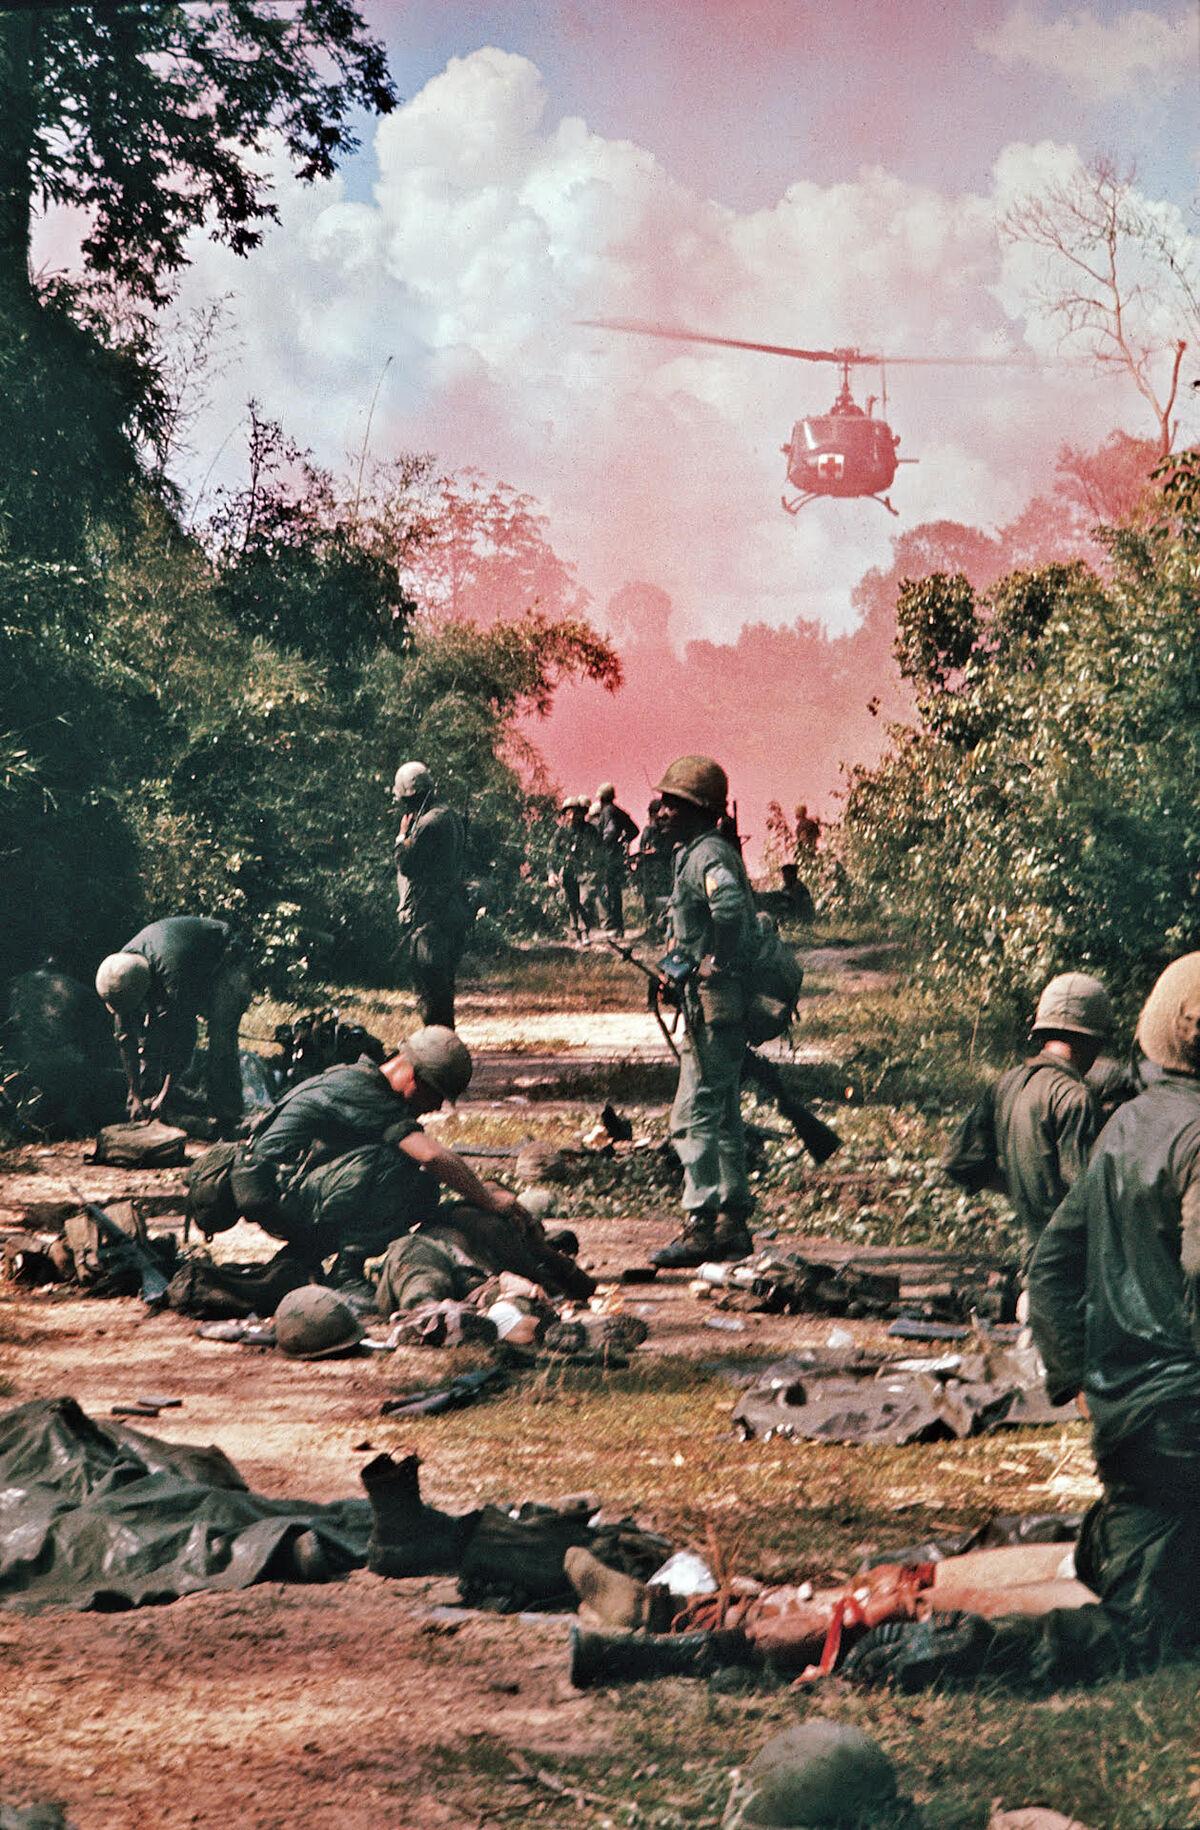 Tim Page, War Zone 'C'–Ambush of 173rd Airborne, 1965. Courtesy of the artist.